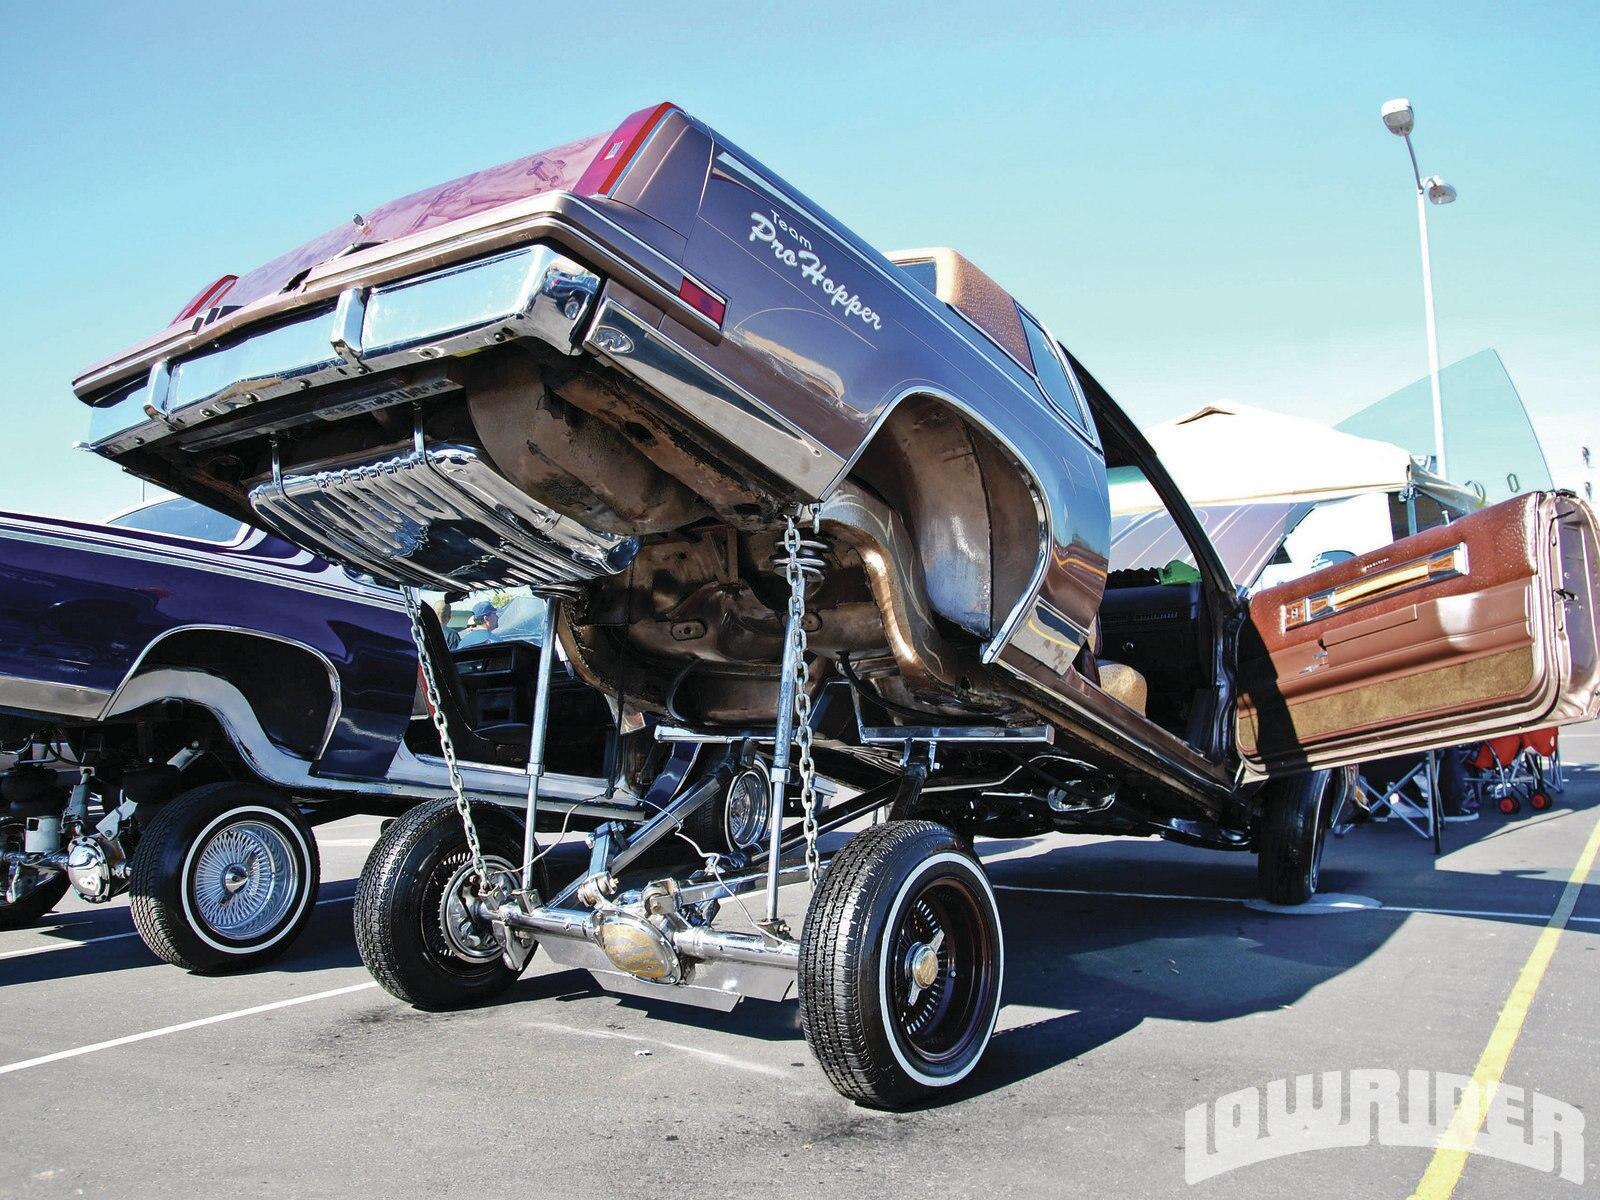 Lowrider Miami >> Santana Car Club Car & Bike Show - Lowrider Magazine